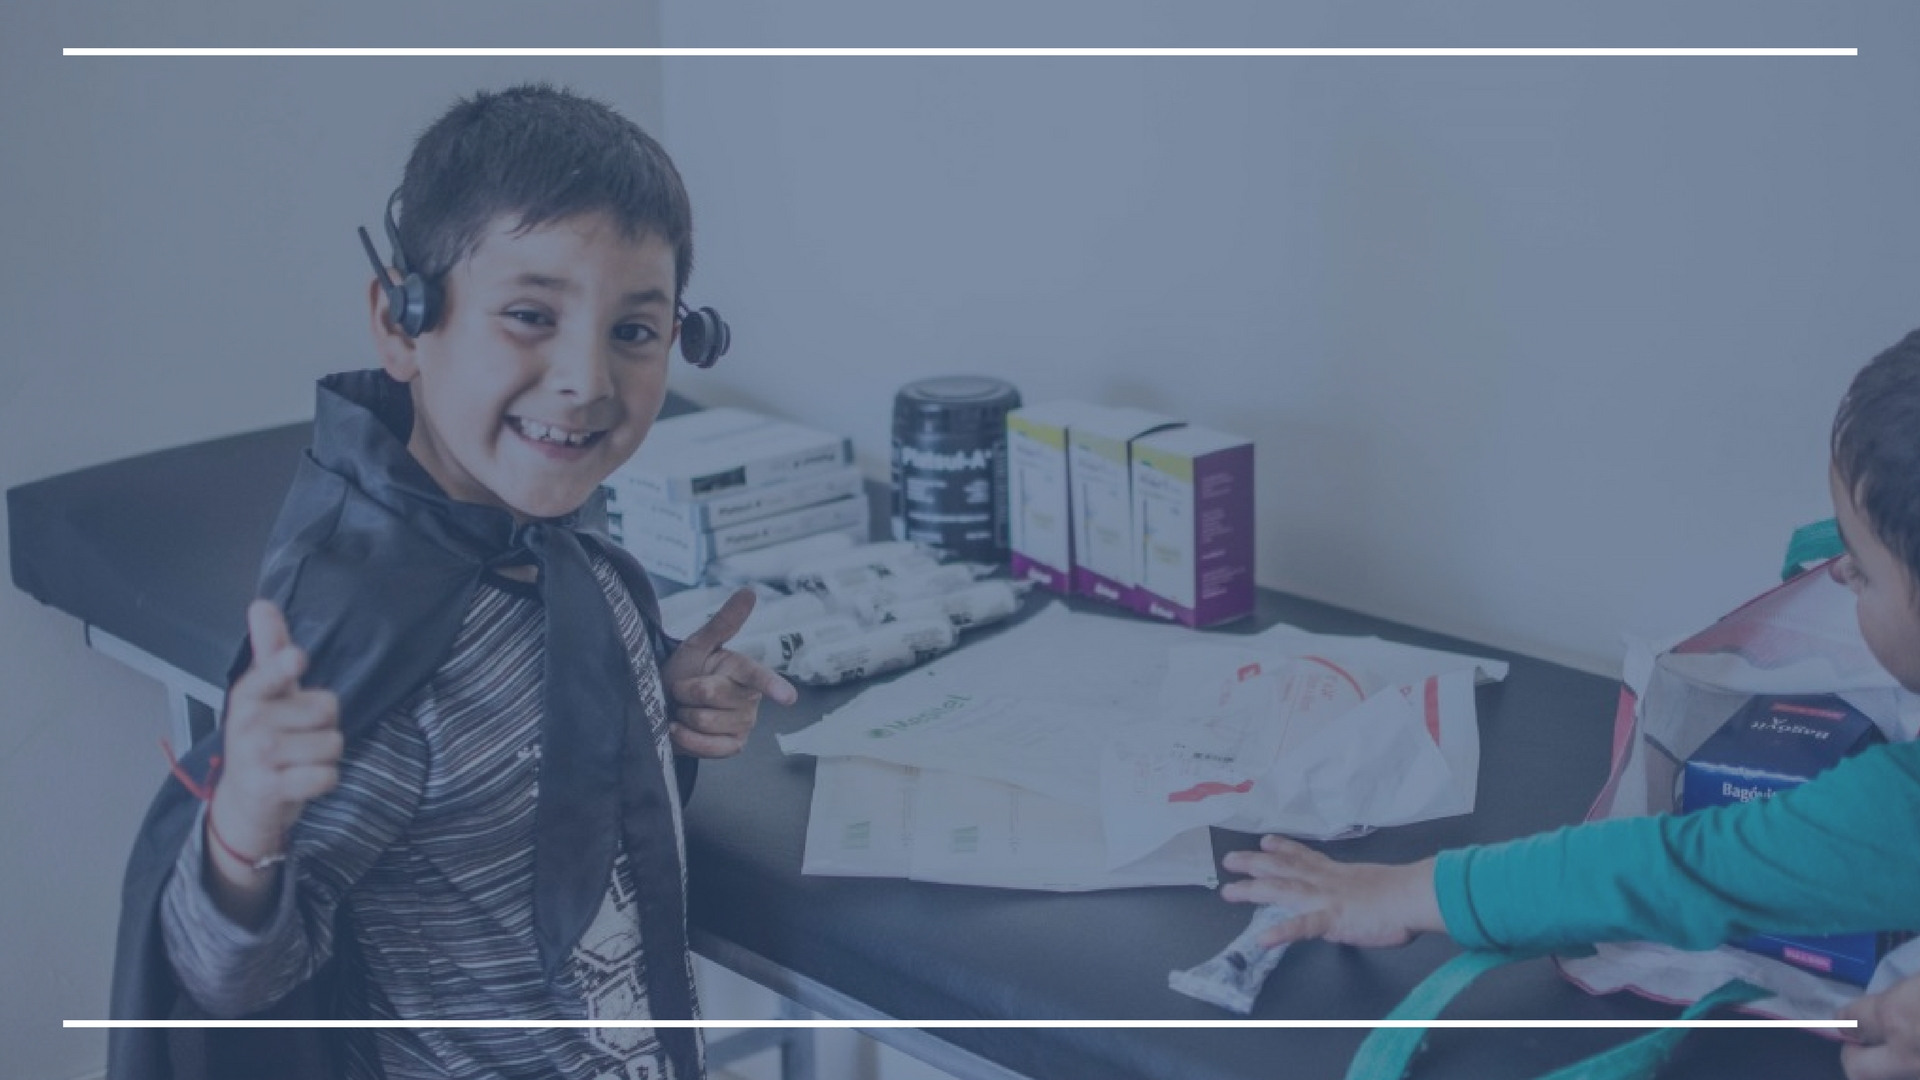 Programa de Distribución de Insumos Gratuitos para Familias con Epidermolisis Bullosa